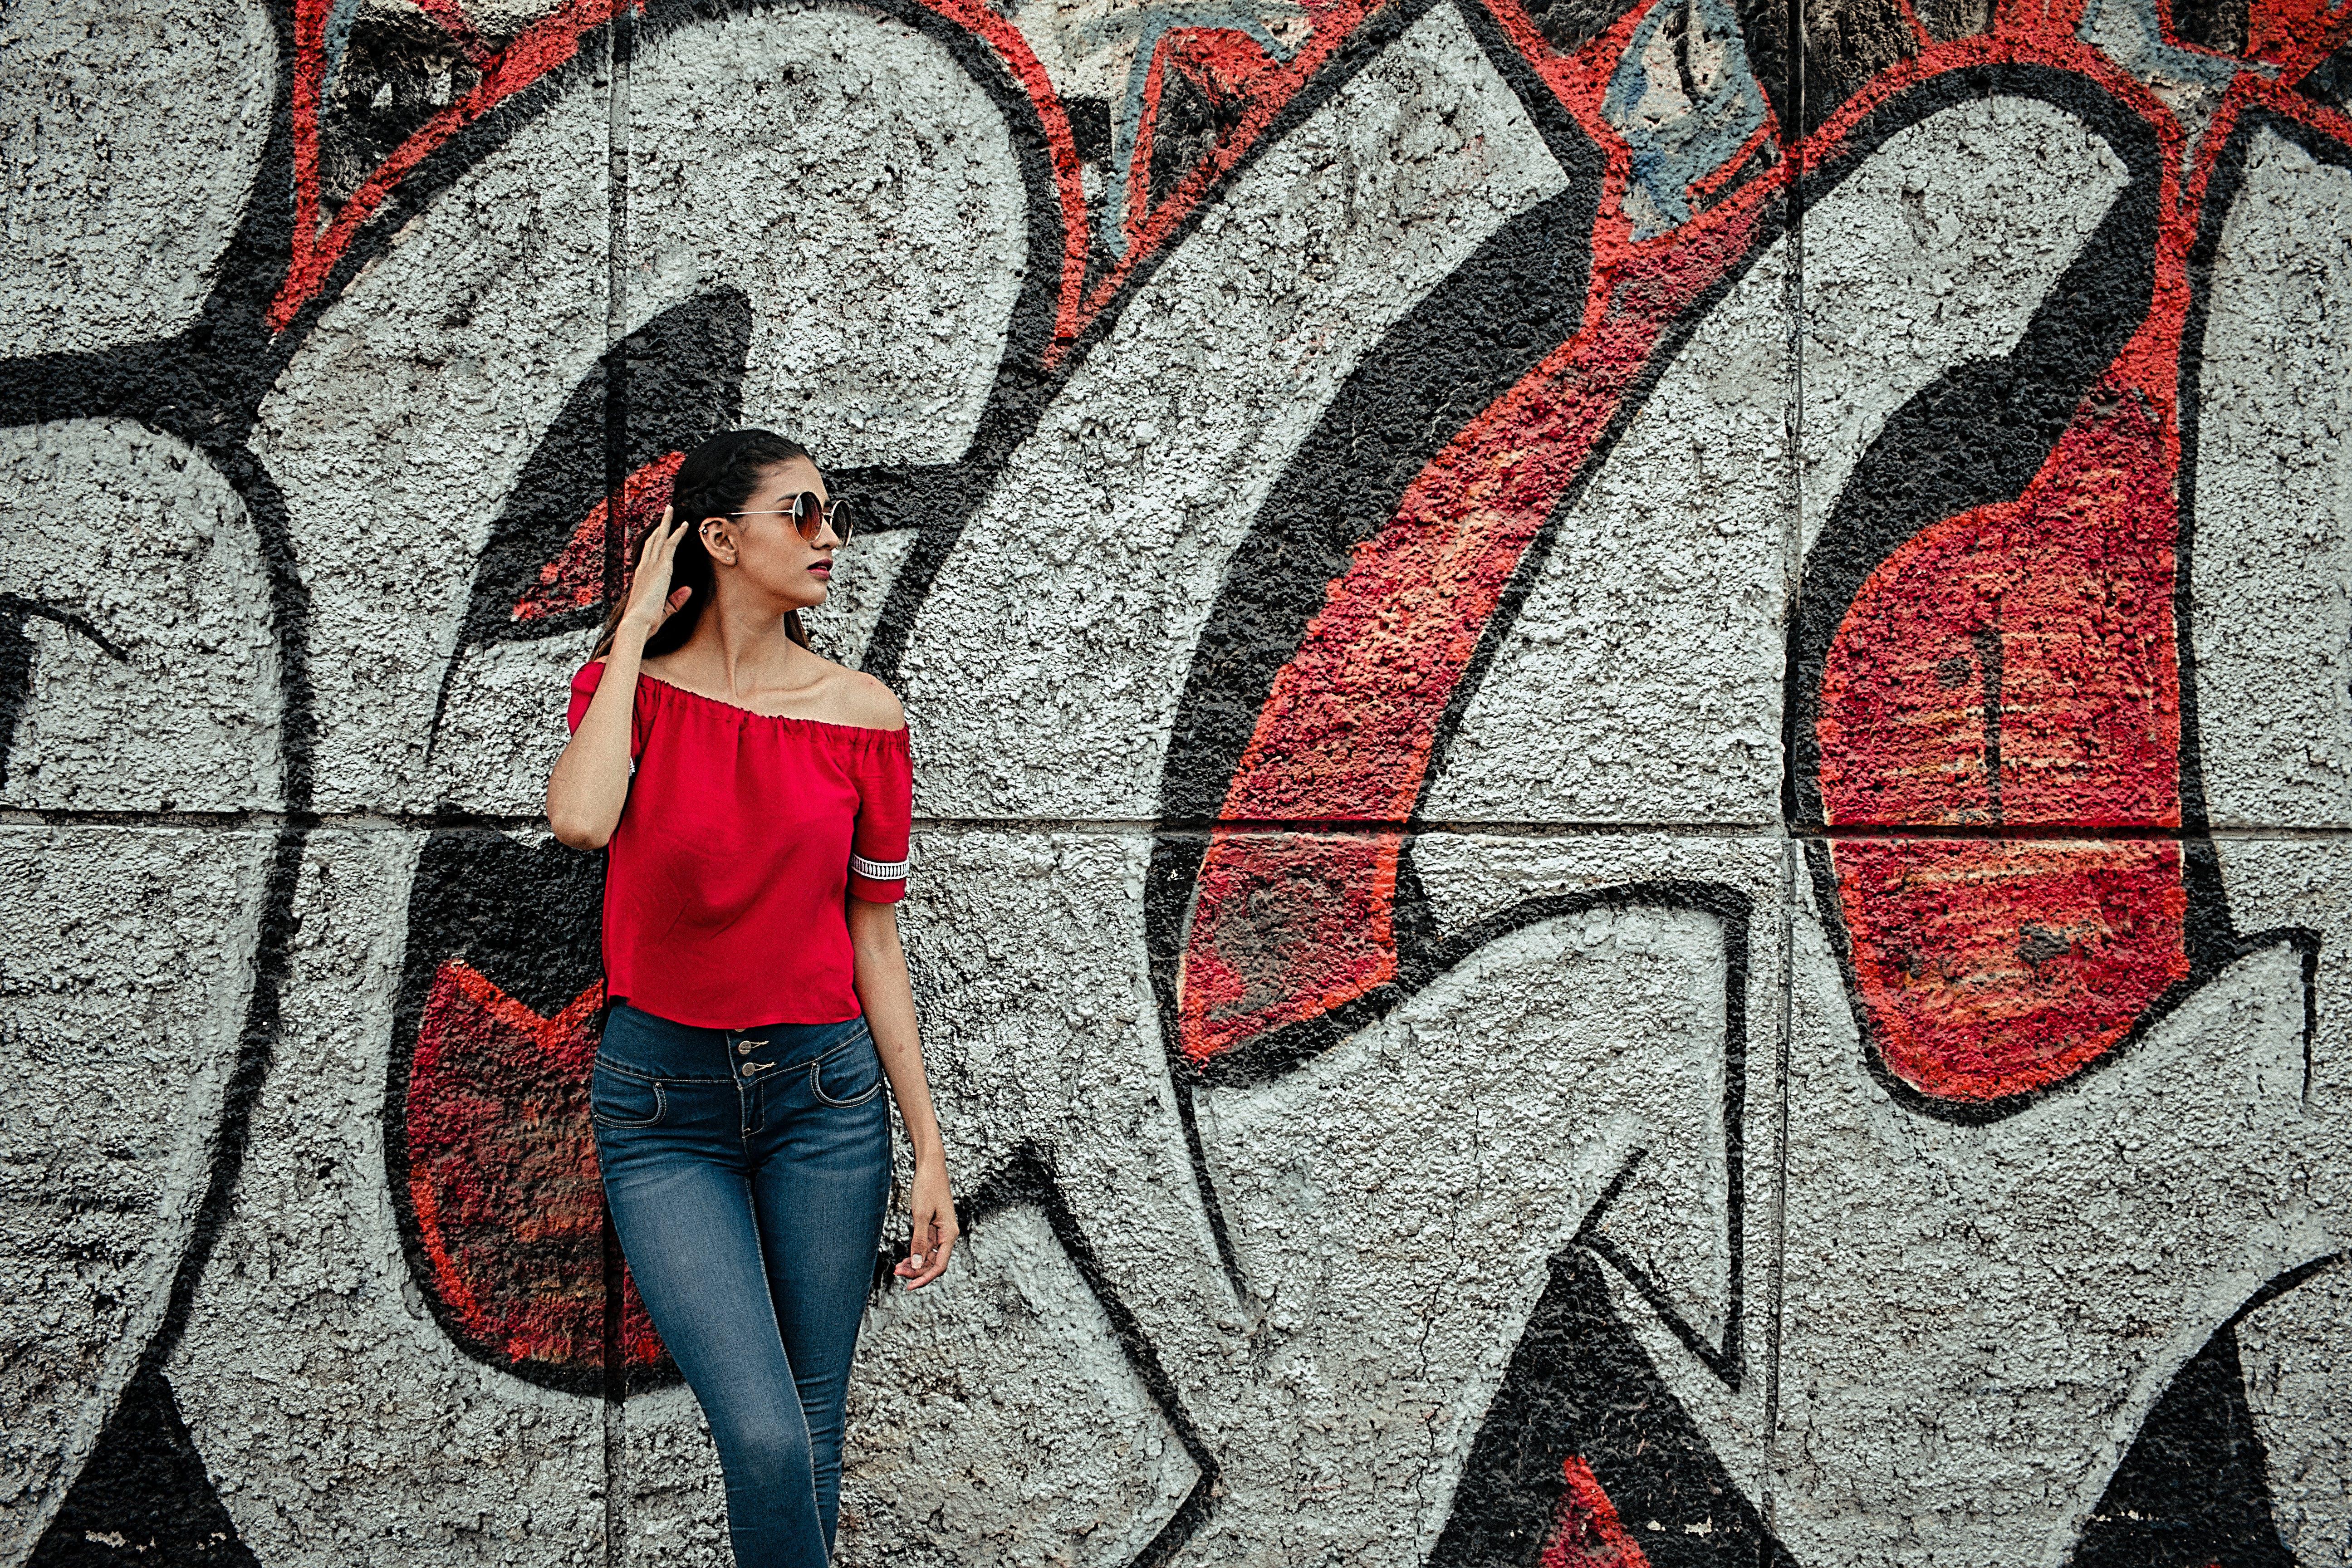 art, art de carrer, artístic